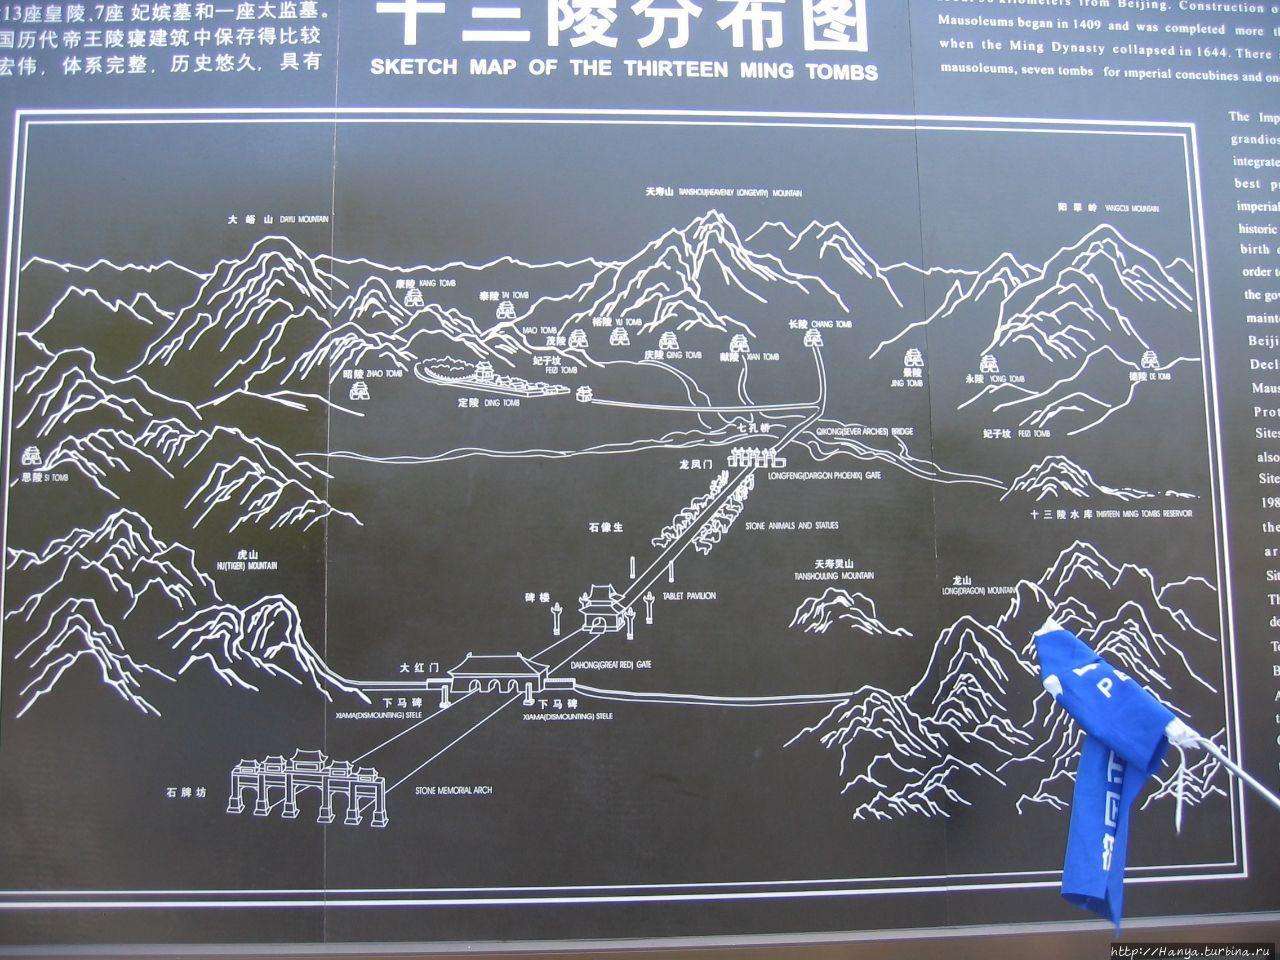 Ши Сан Лин – 13 минских м